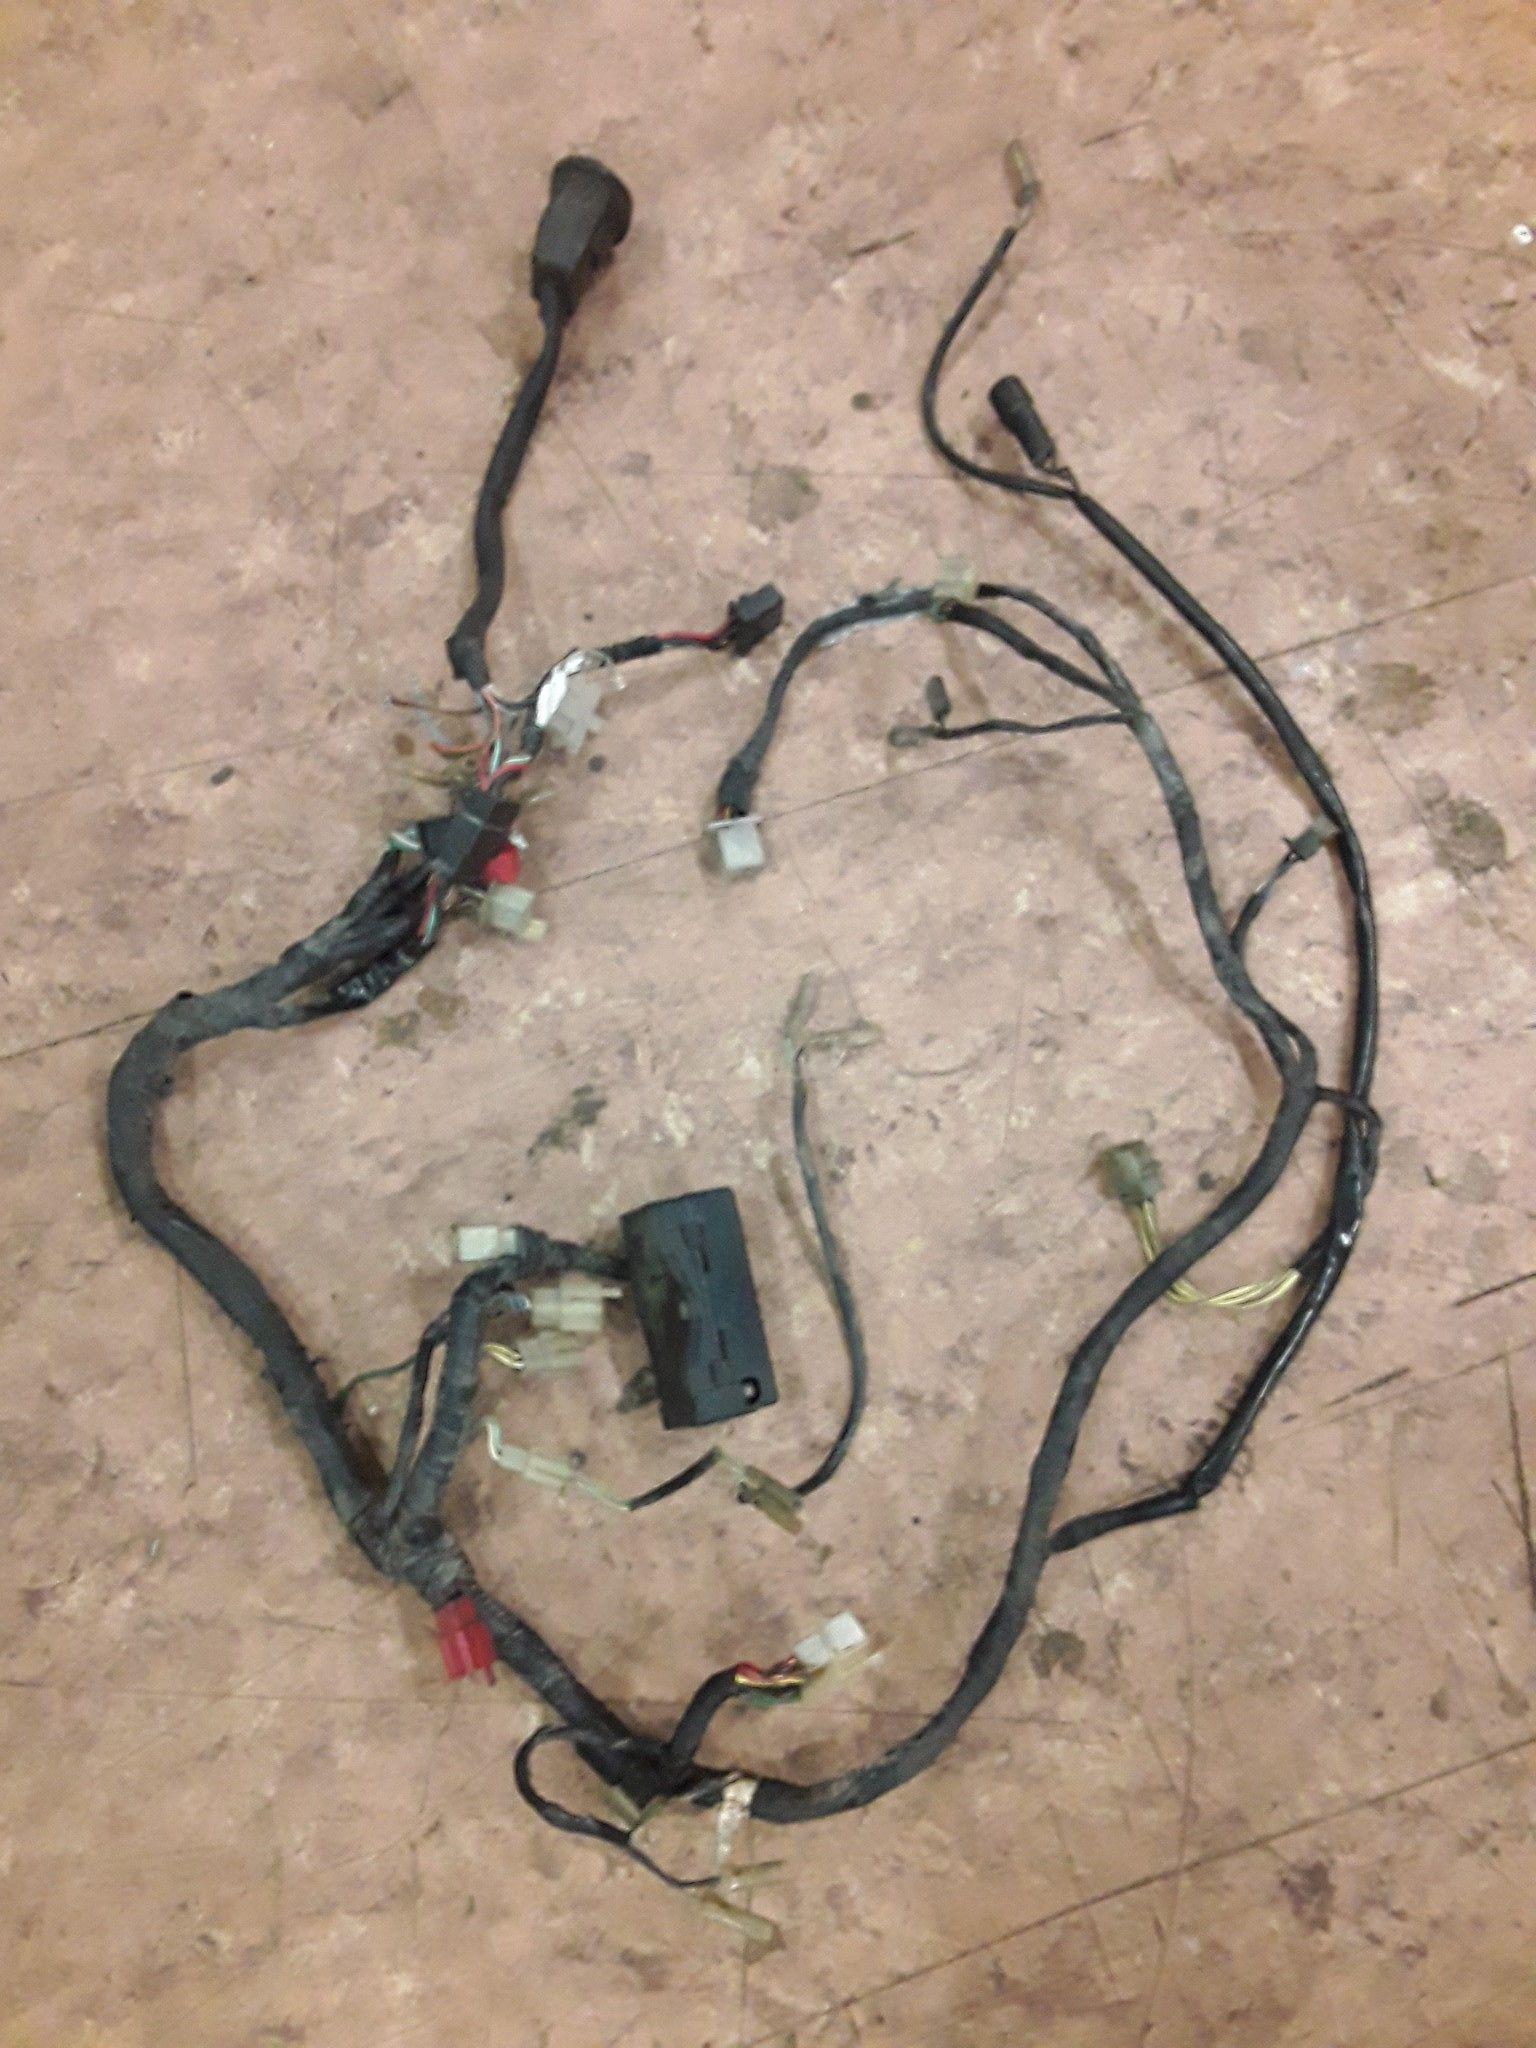 1981 Honda Gl1100 Goldwing Wiring - wiring diagram on the net on